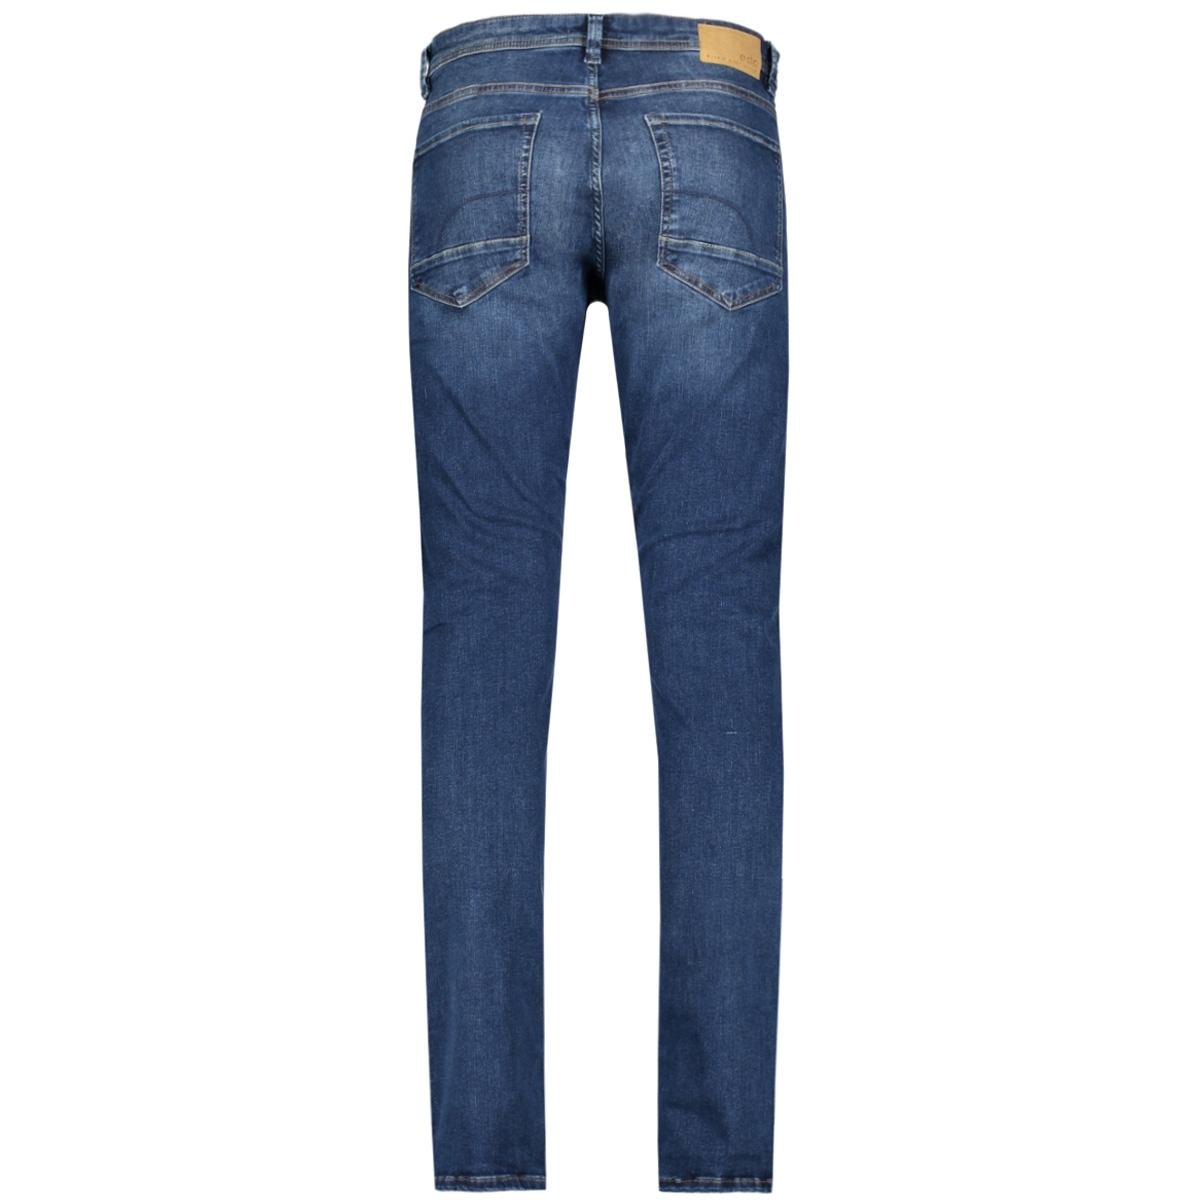 127cc2b002 edc jeans c902